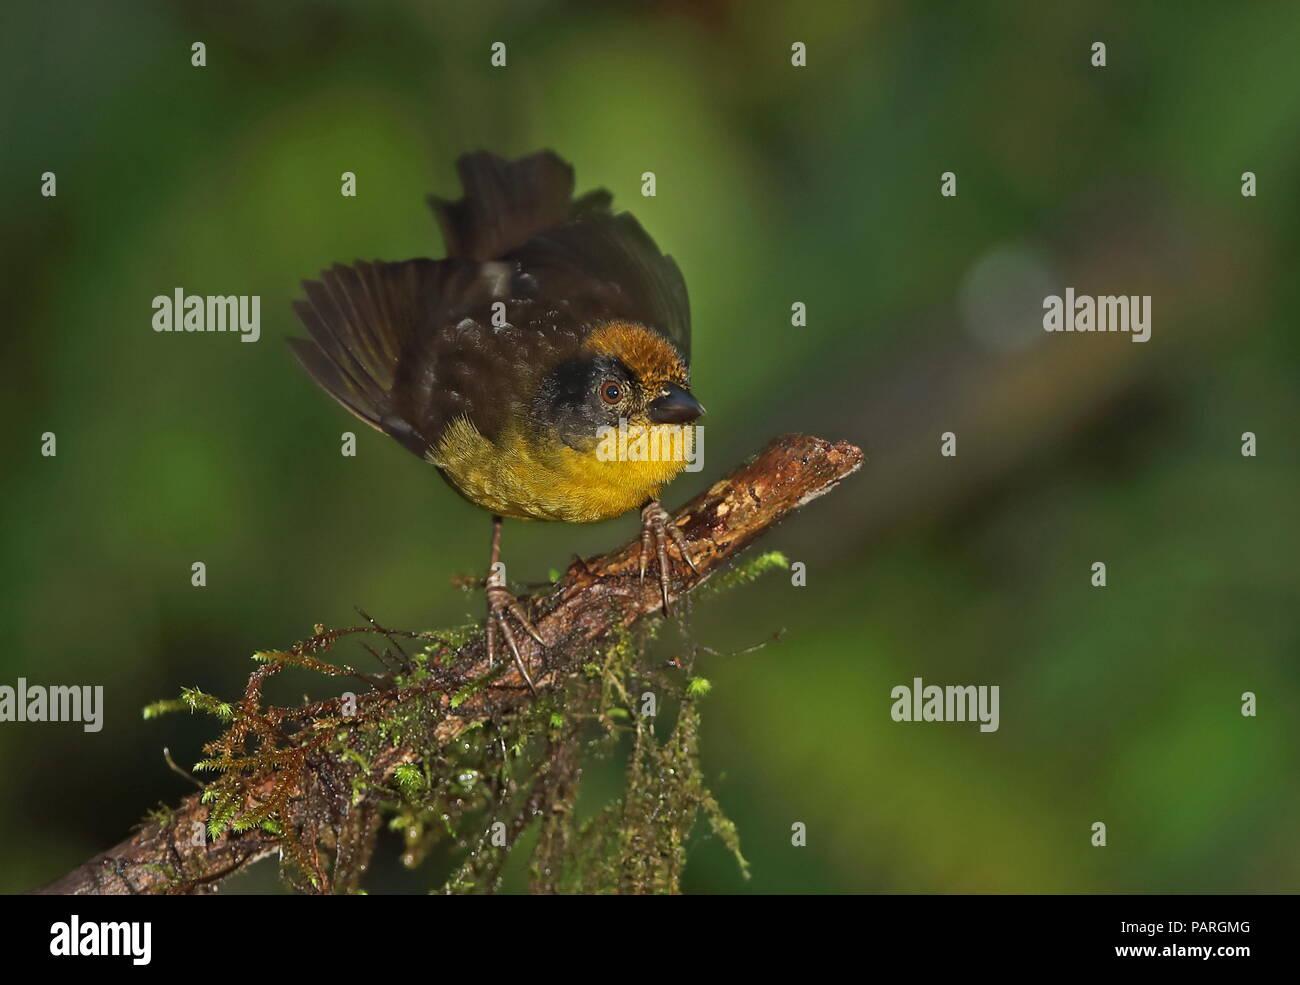 Yellow-breasted Brush-finch (Atlapetes latinuchus spodionotus) adult standing on mossy branch  Vinicio Birdwatchers House, Nono-Mindo Road. Ecuador    - Stock Image